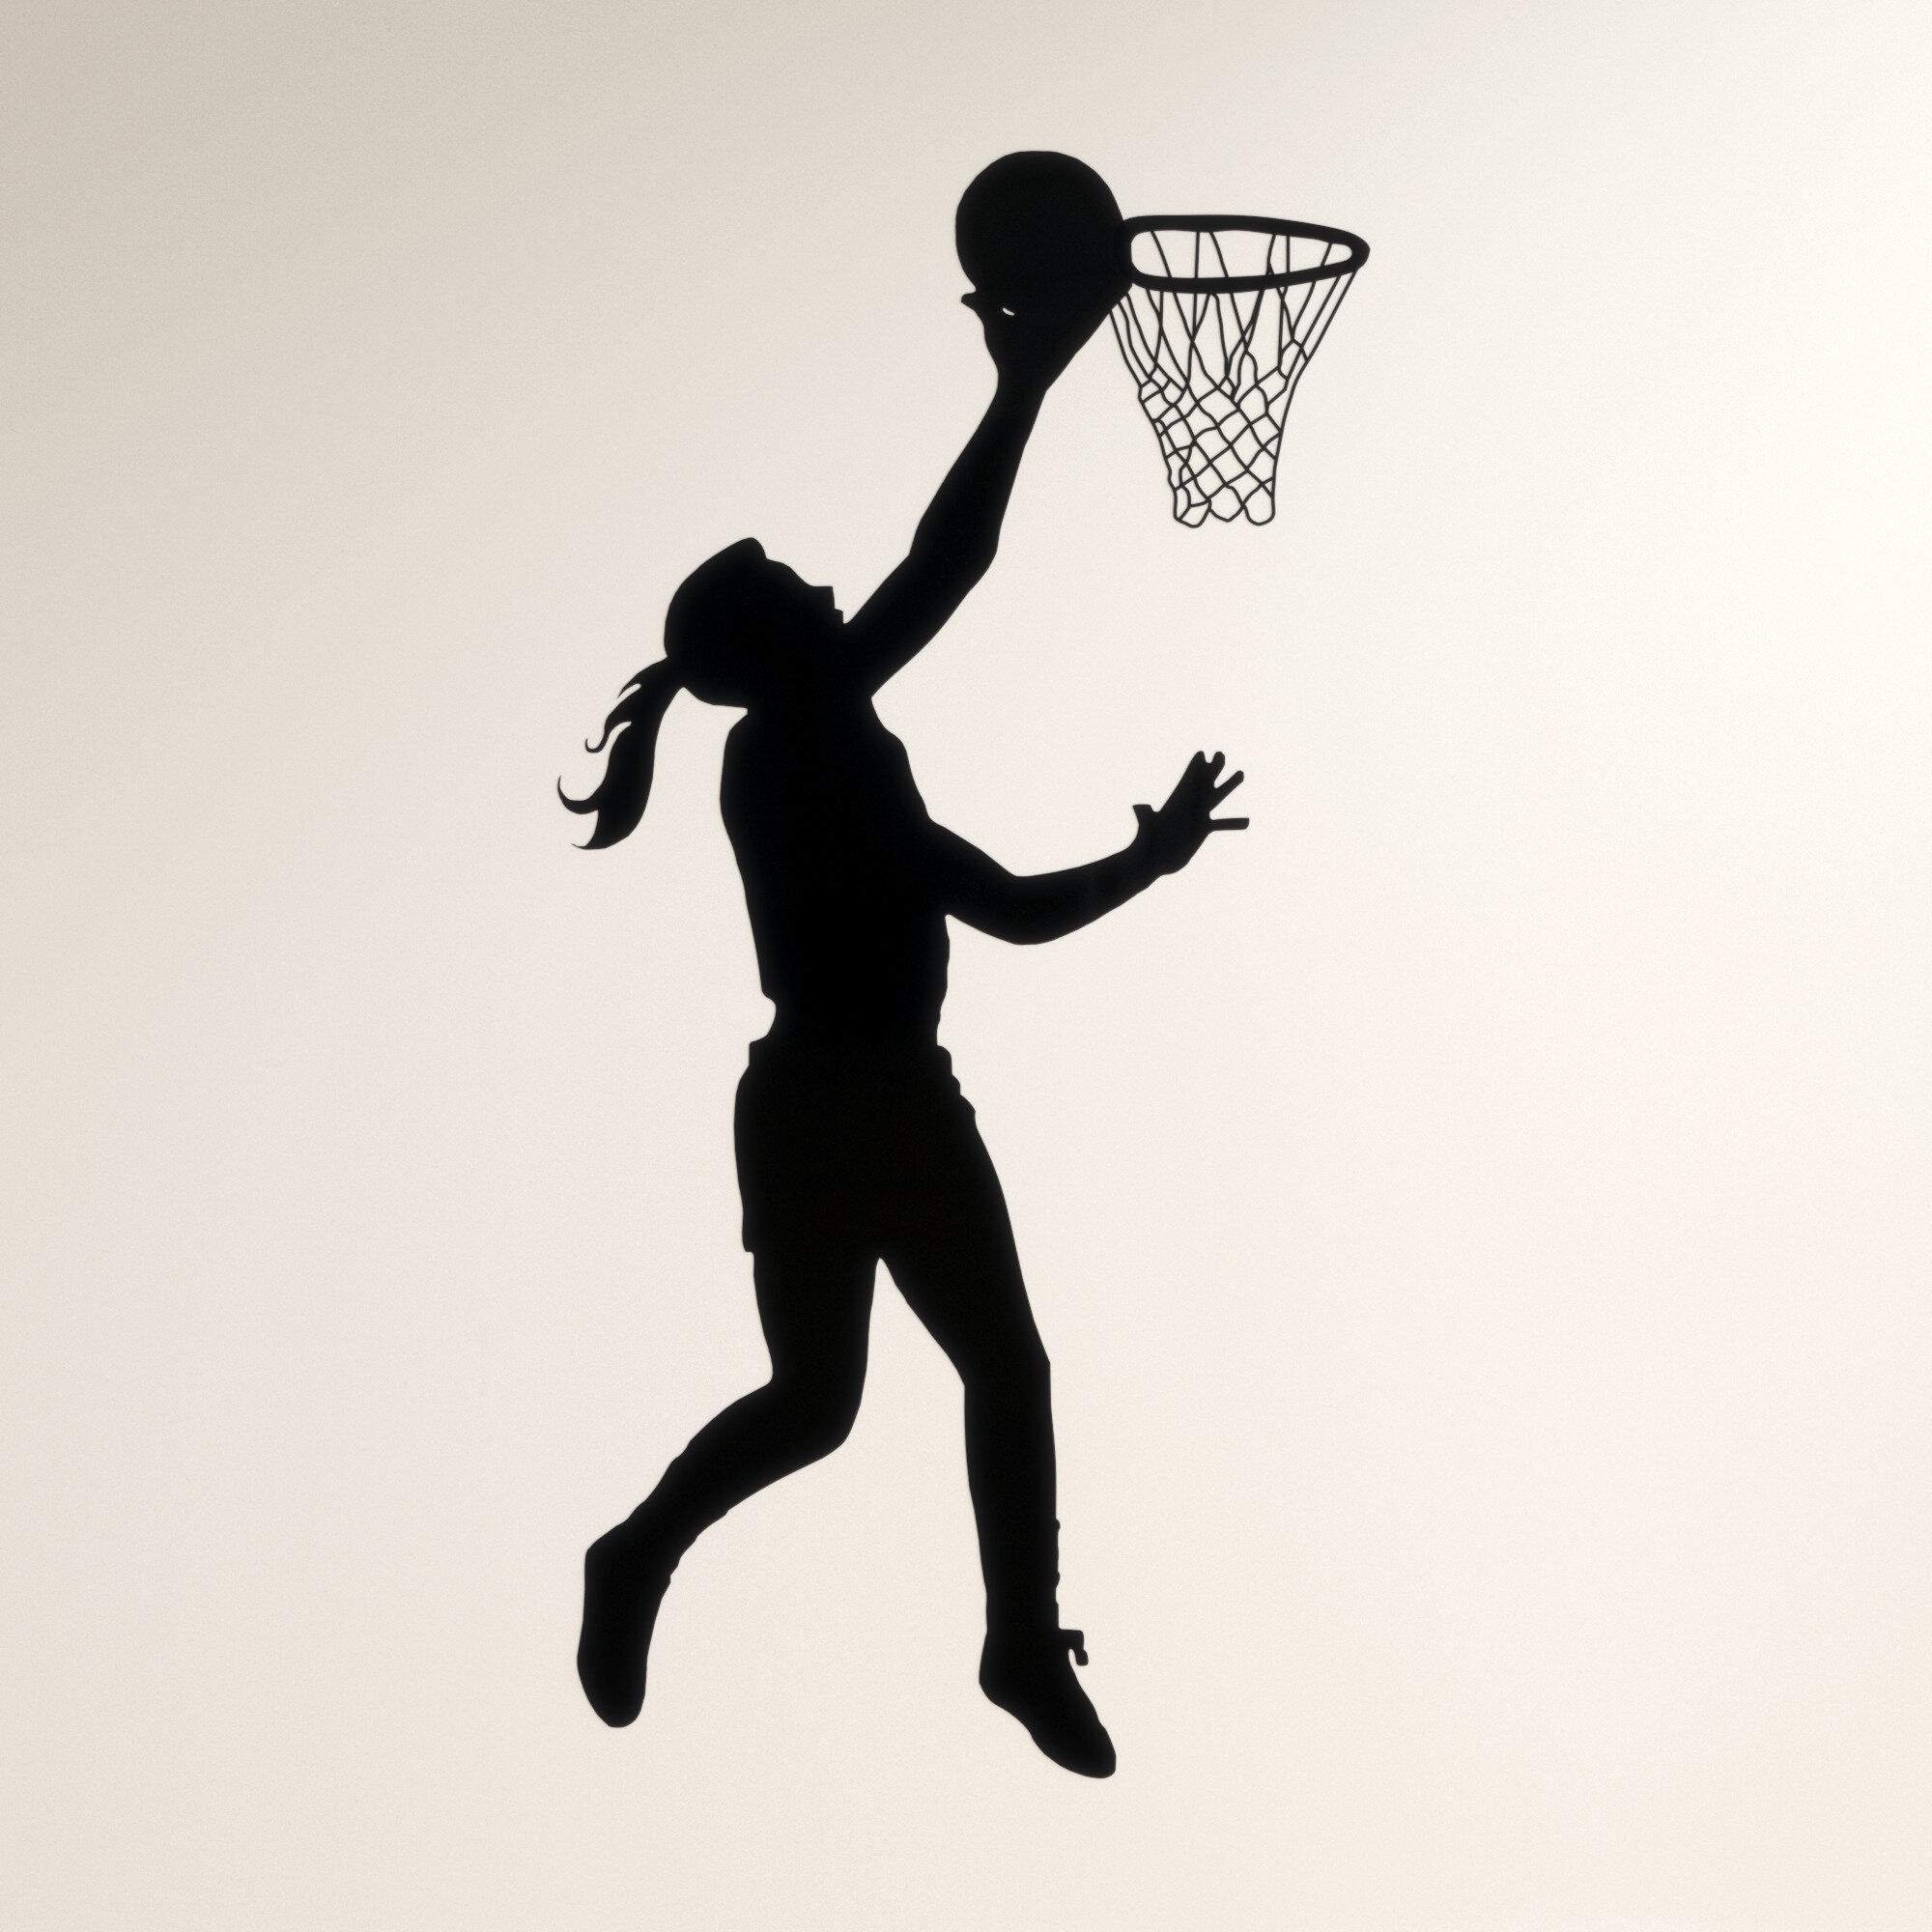 Tennis Guys Wall Decal Set Teens Art Teams Sticker Athlete Kids Sports